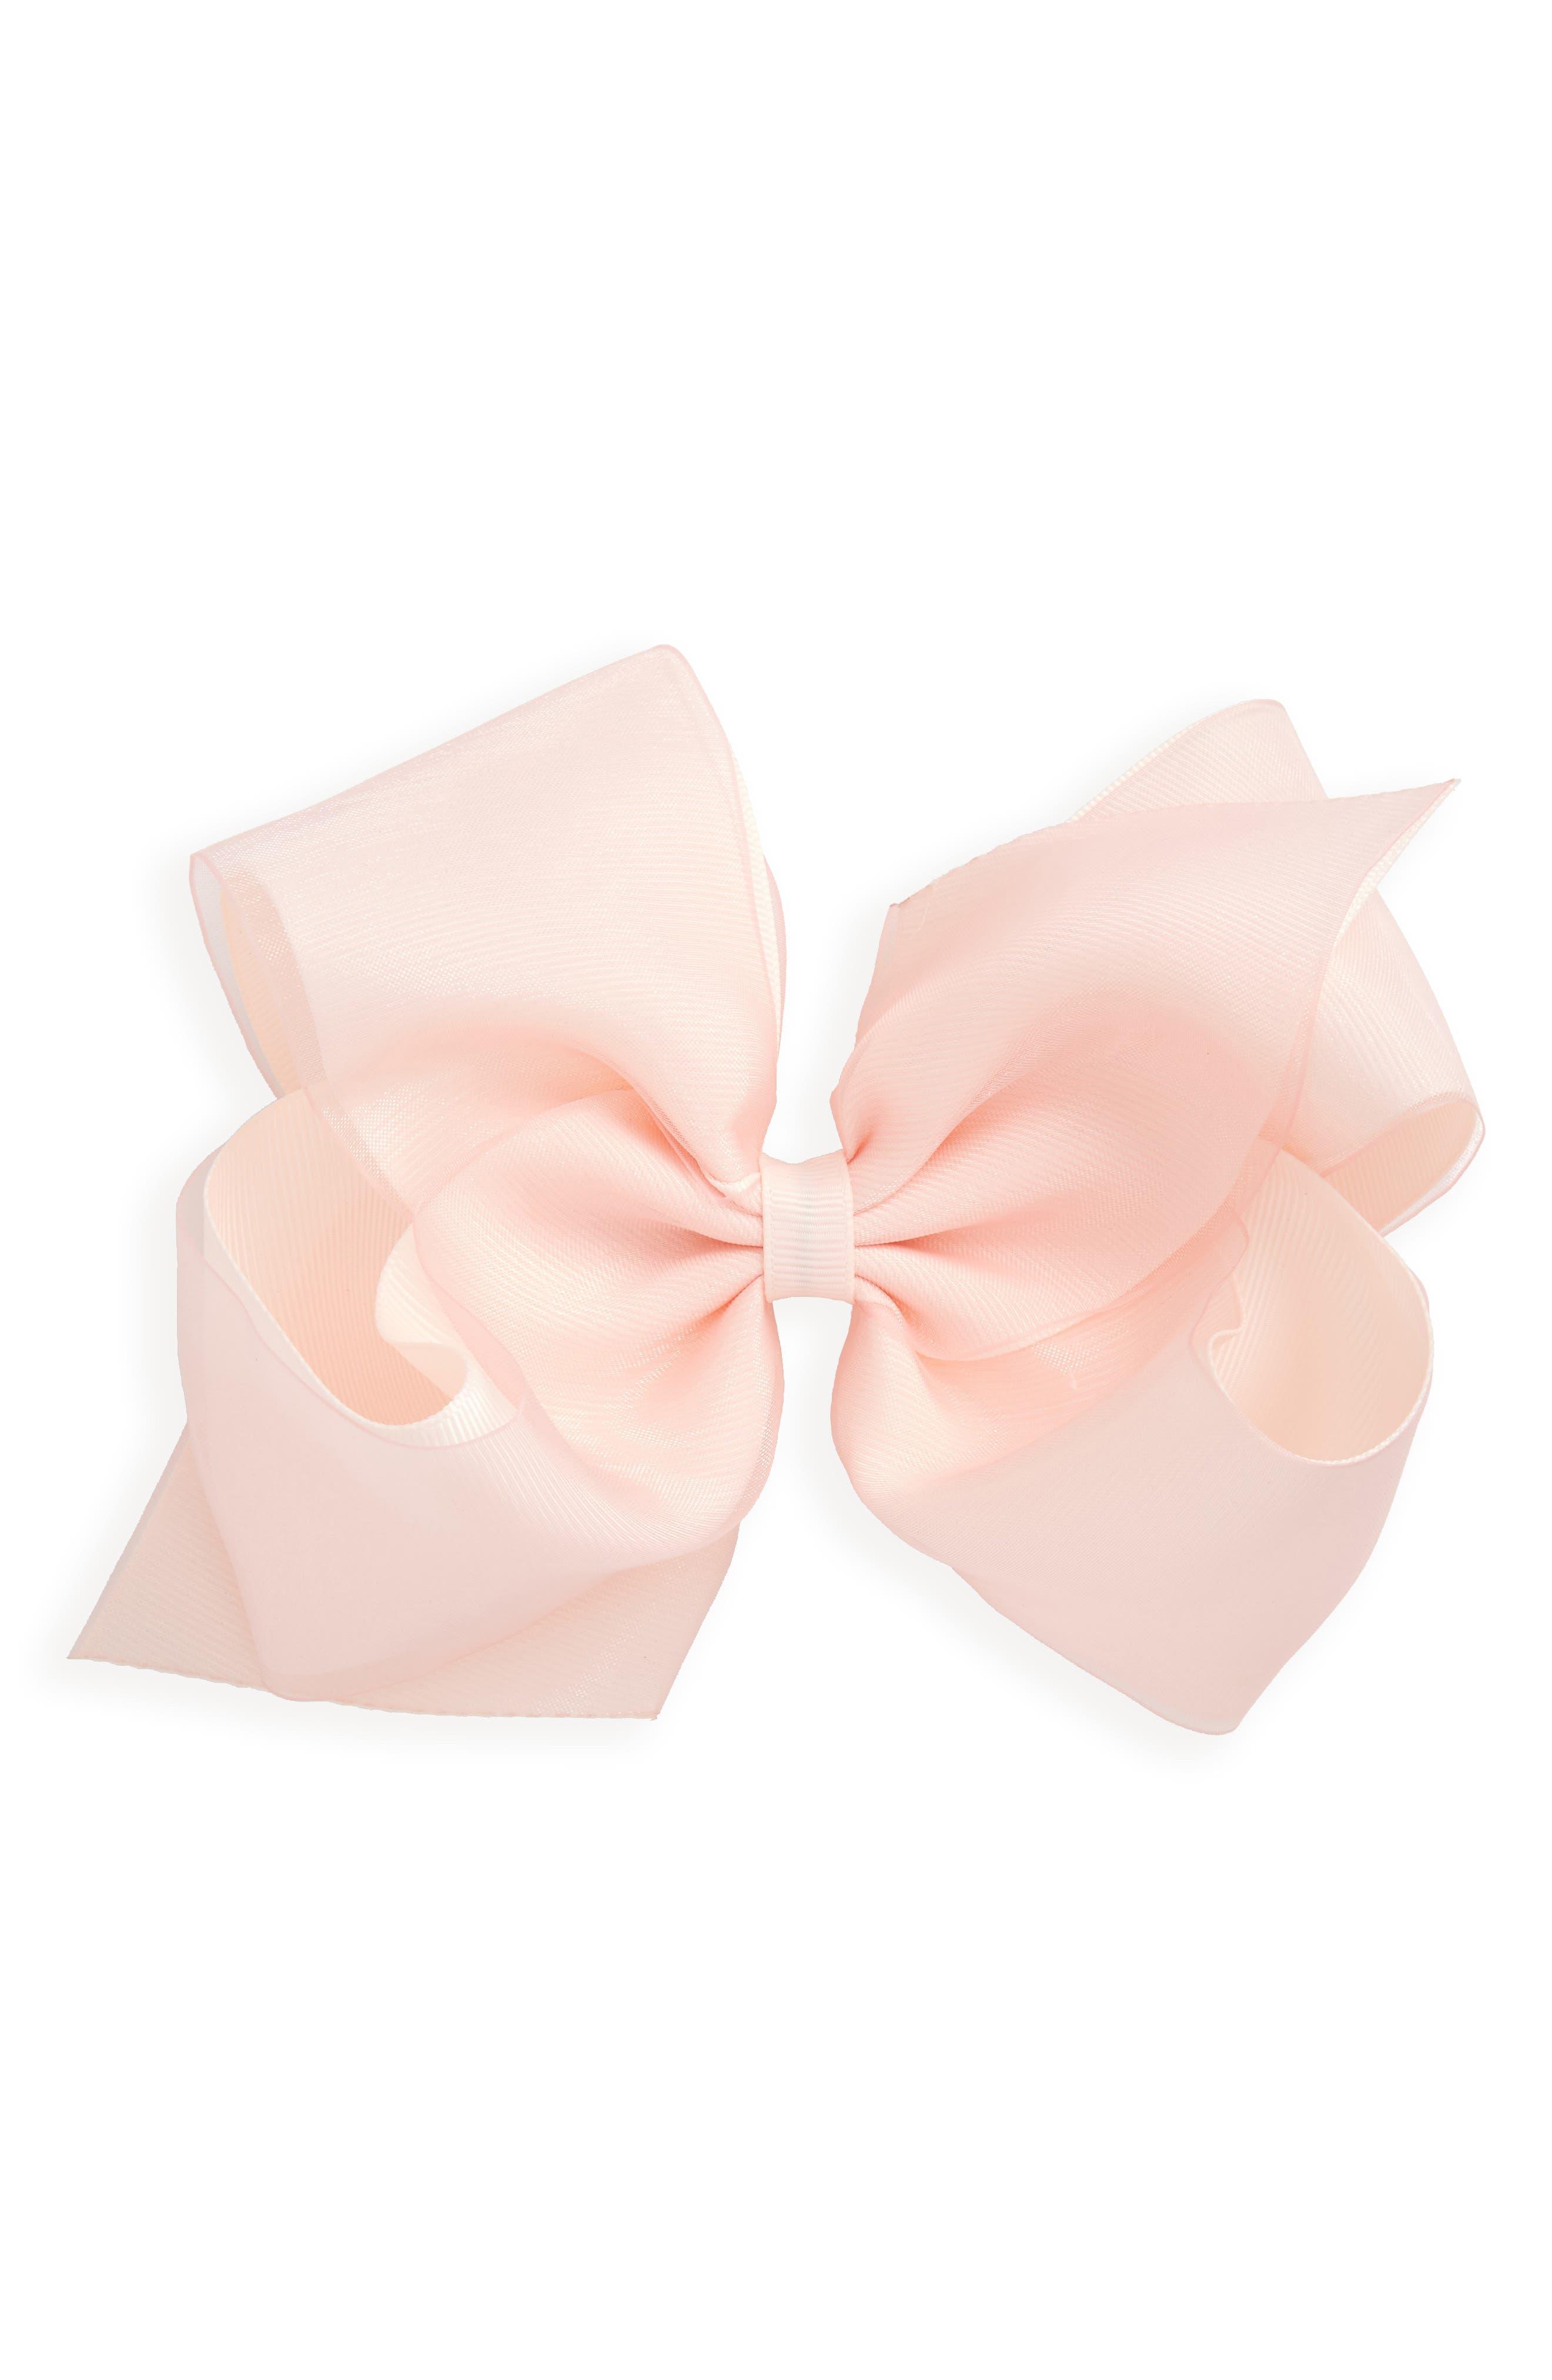 King Organza Overlay Bow Hair Clip,                         Main,                         color, SOFT ROSE